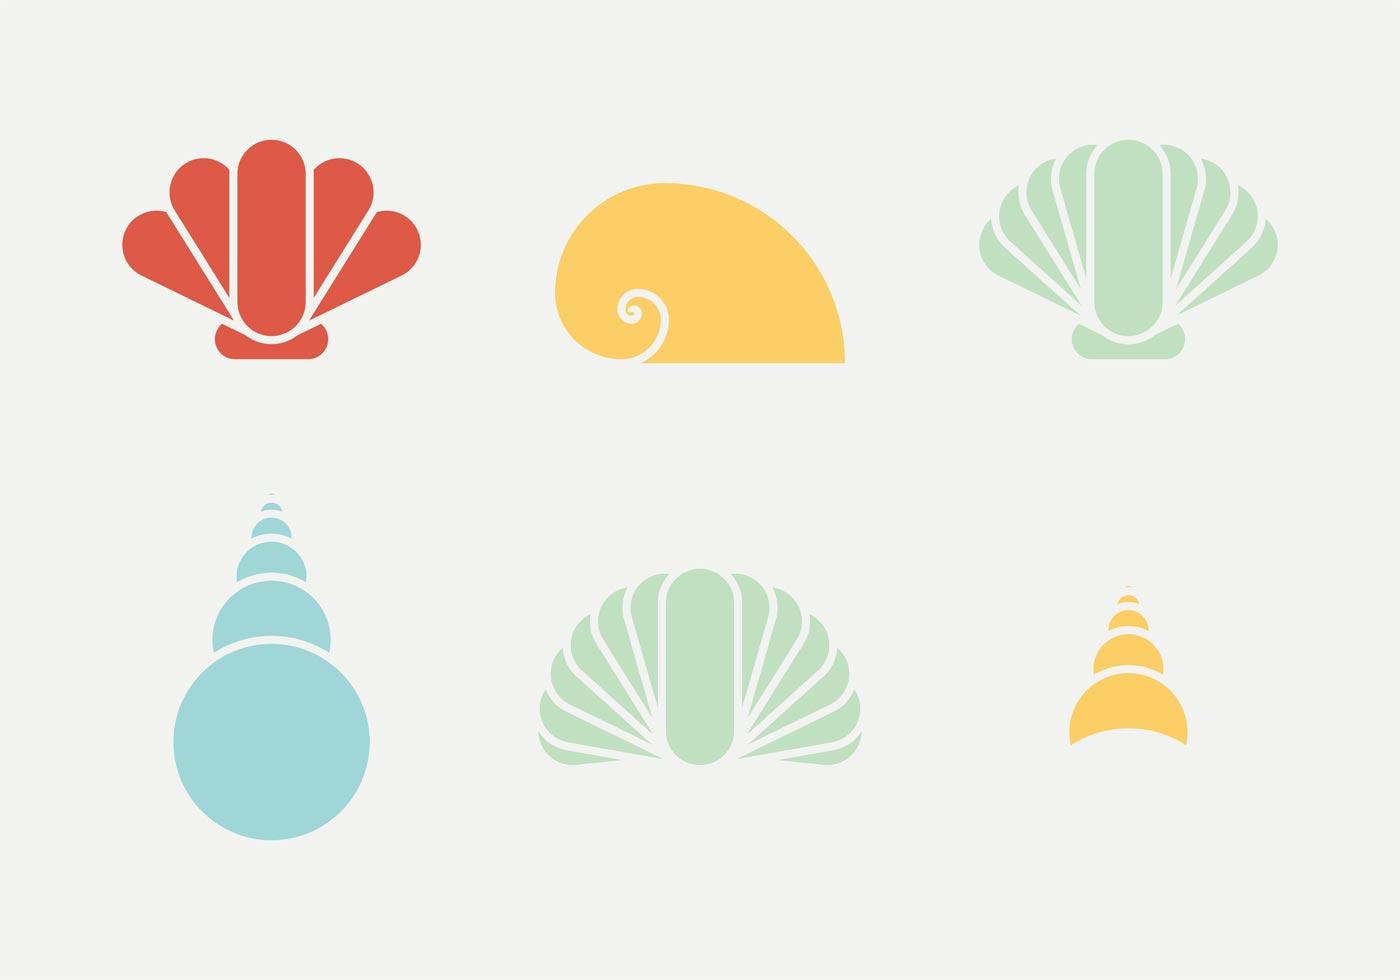 shell logo free vector art 6289 free downloads rh vecteezy com shell logo vector download shell logo vector download